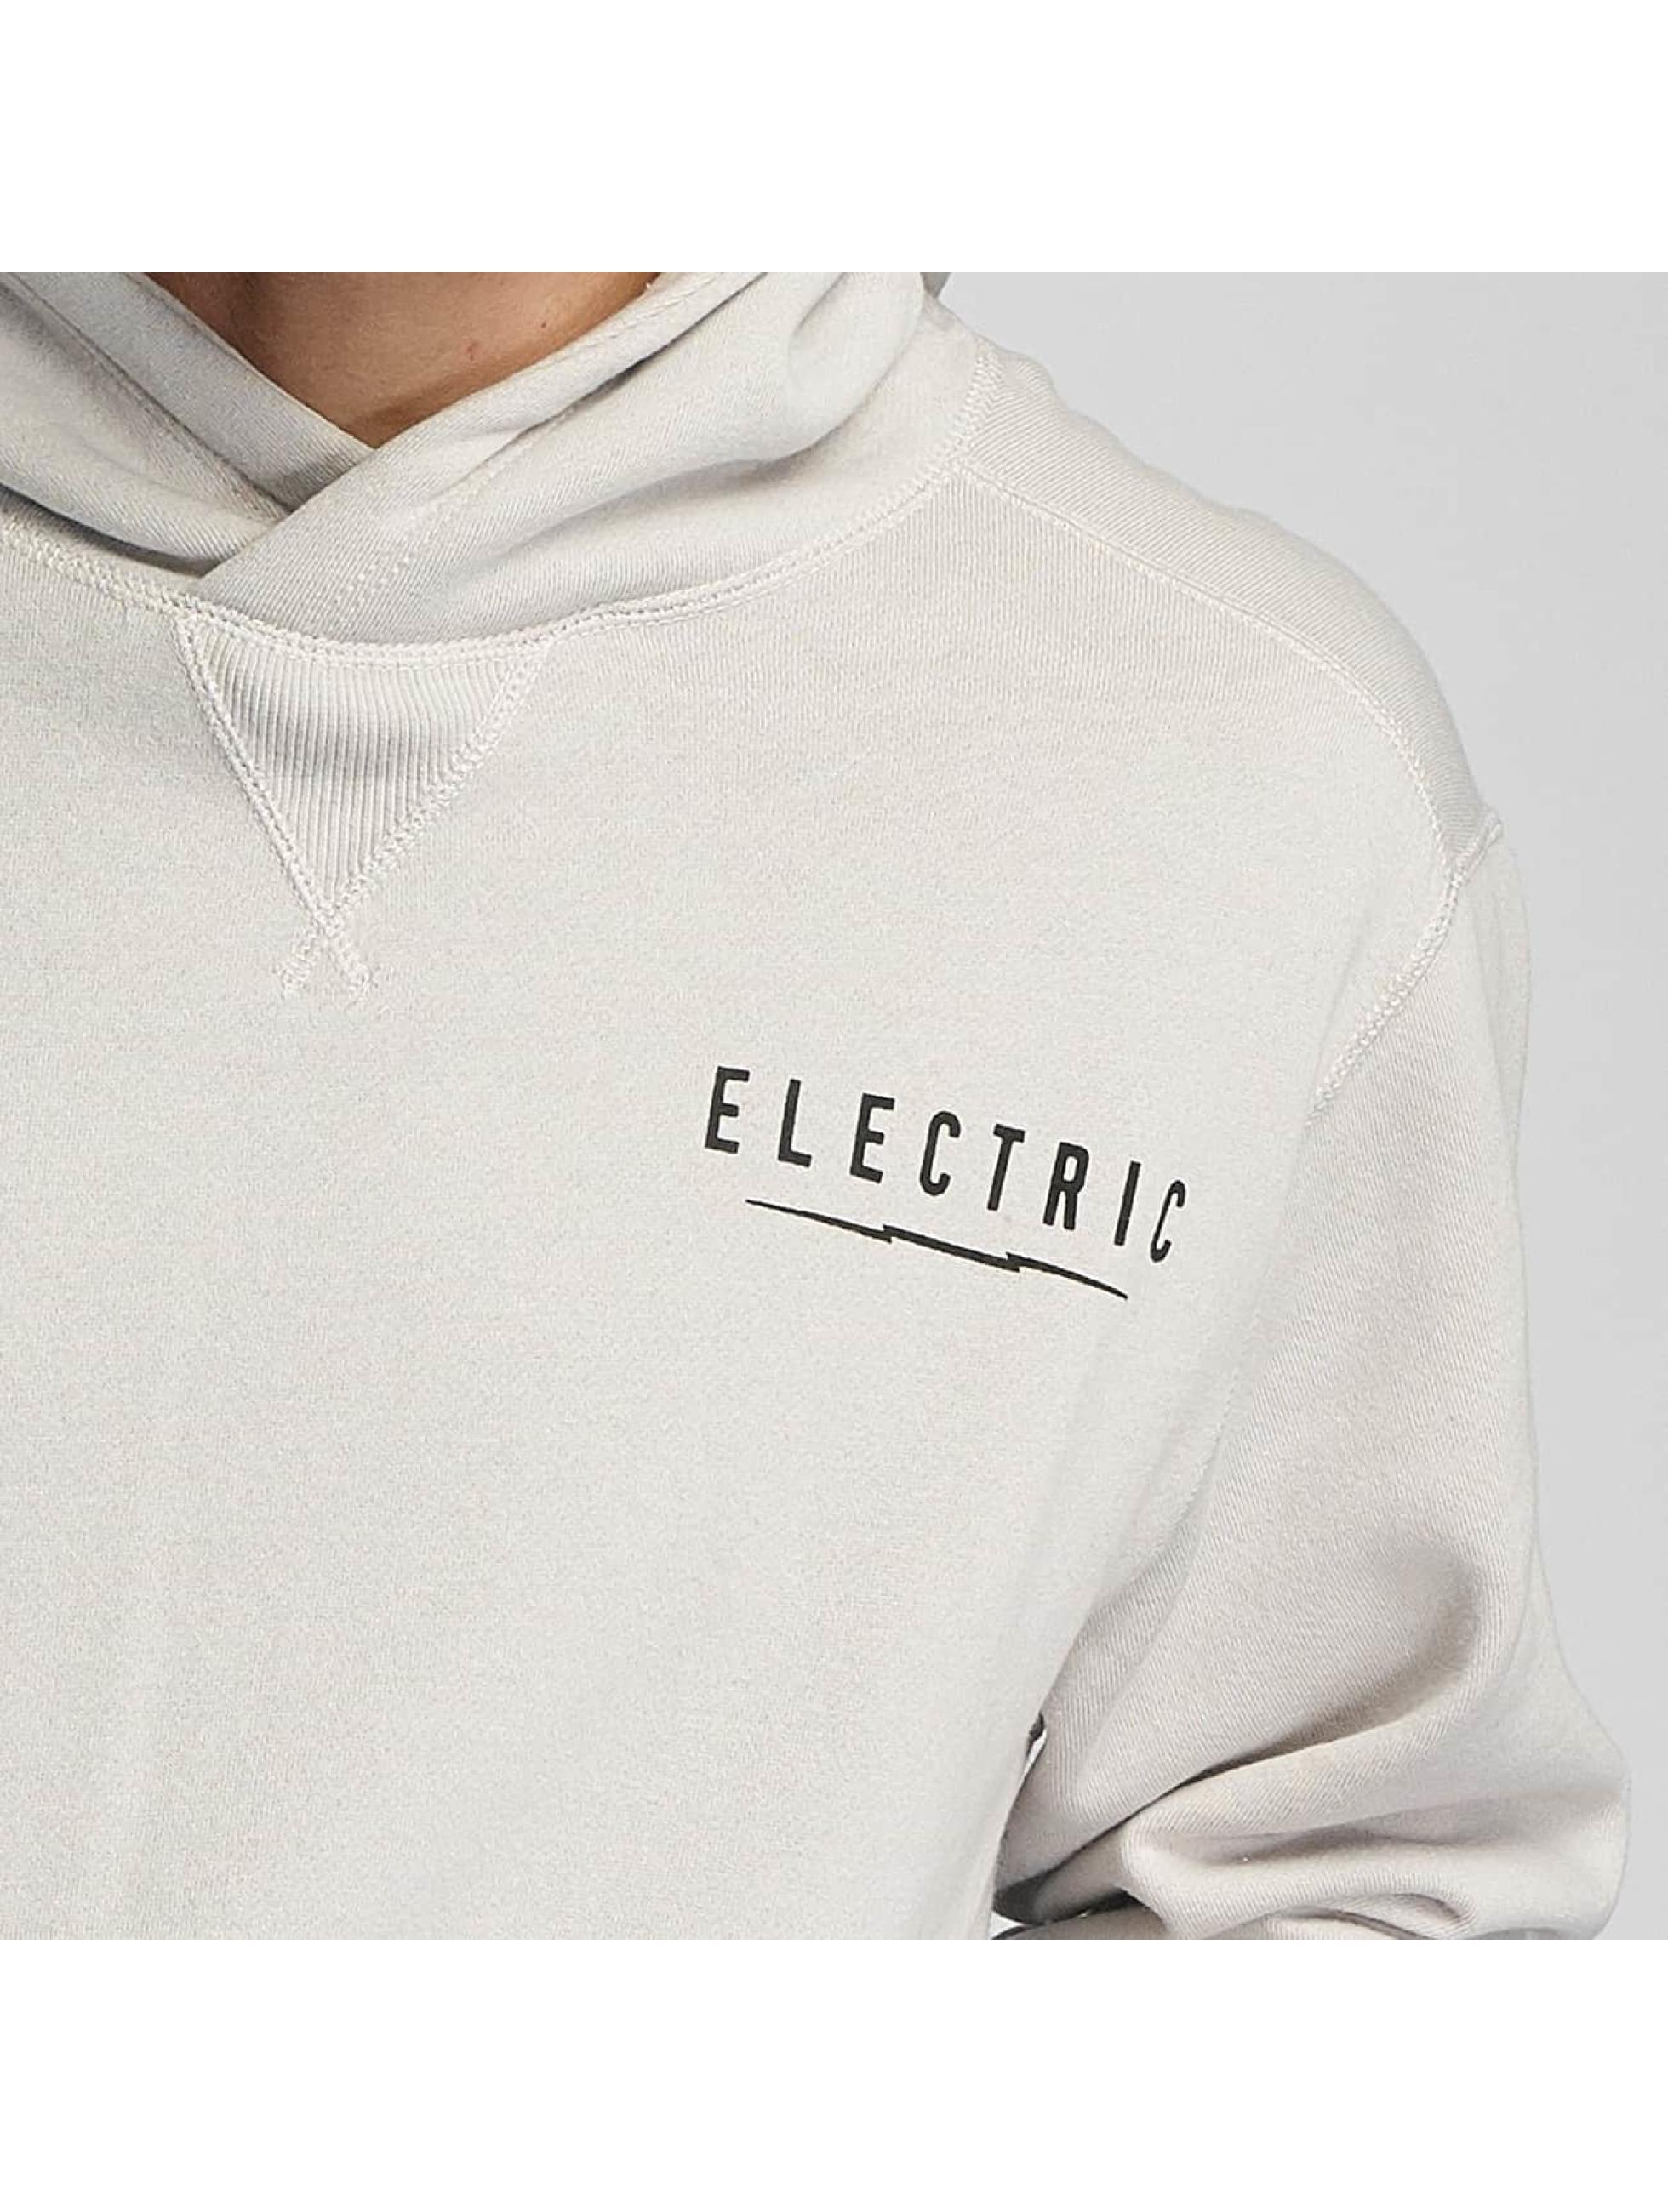 Electric Hoody UNDERVOLT II grijs